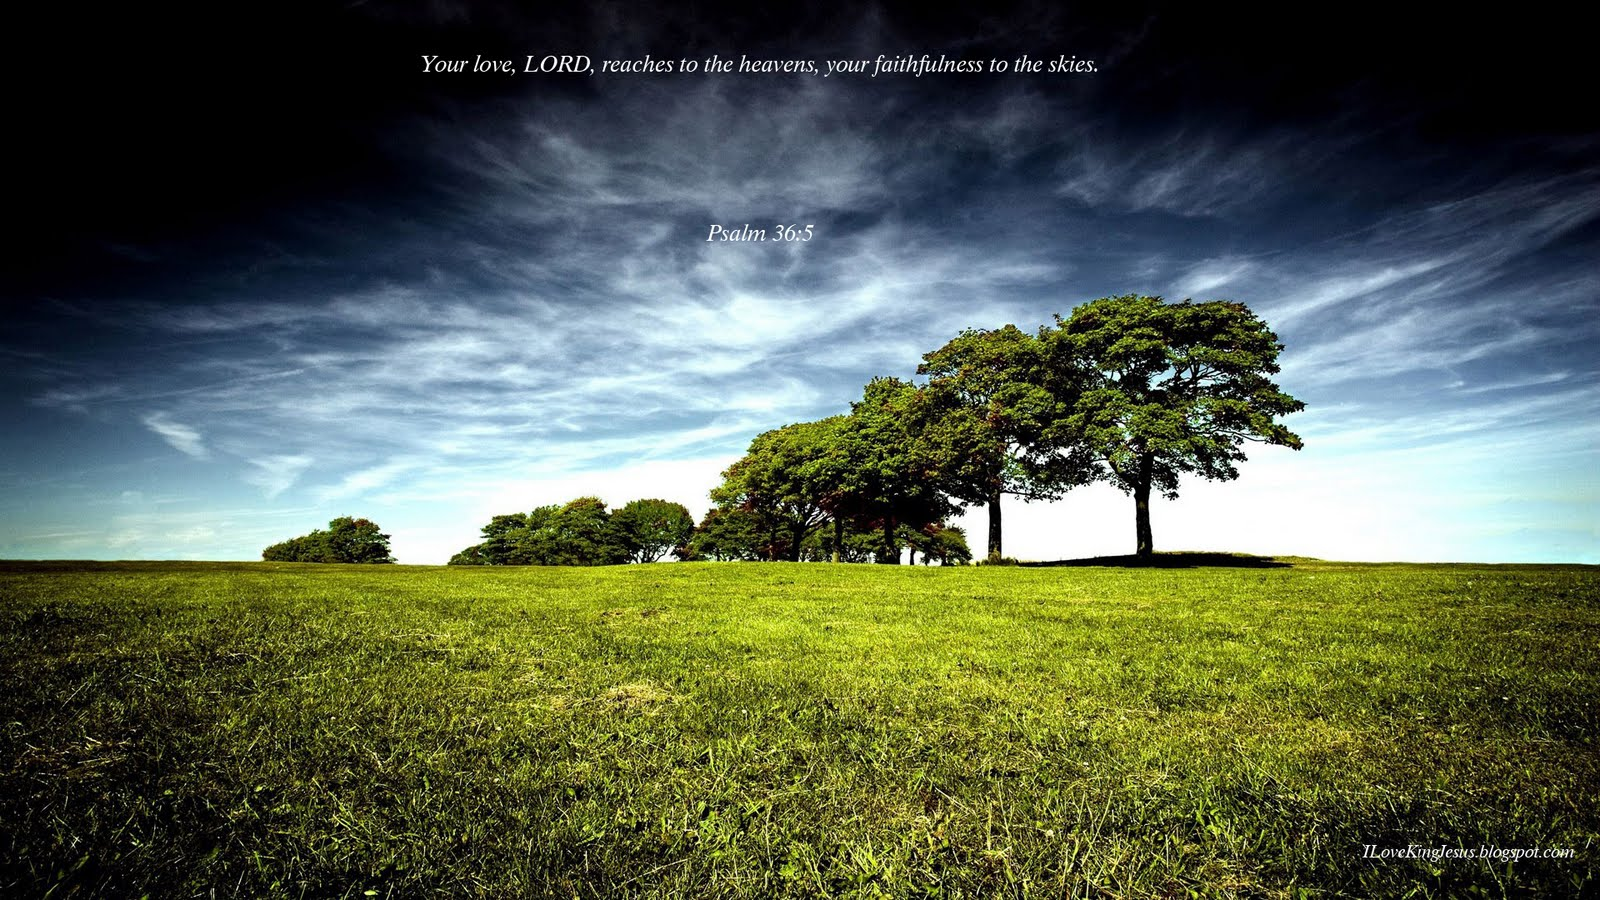 I Love King Jesus HD Christian Wallpapers